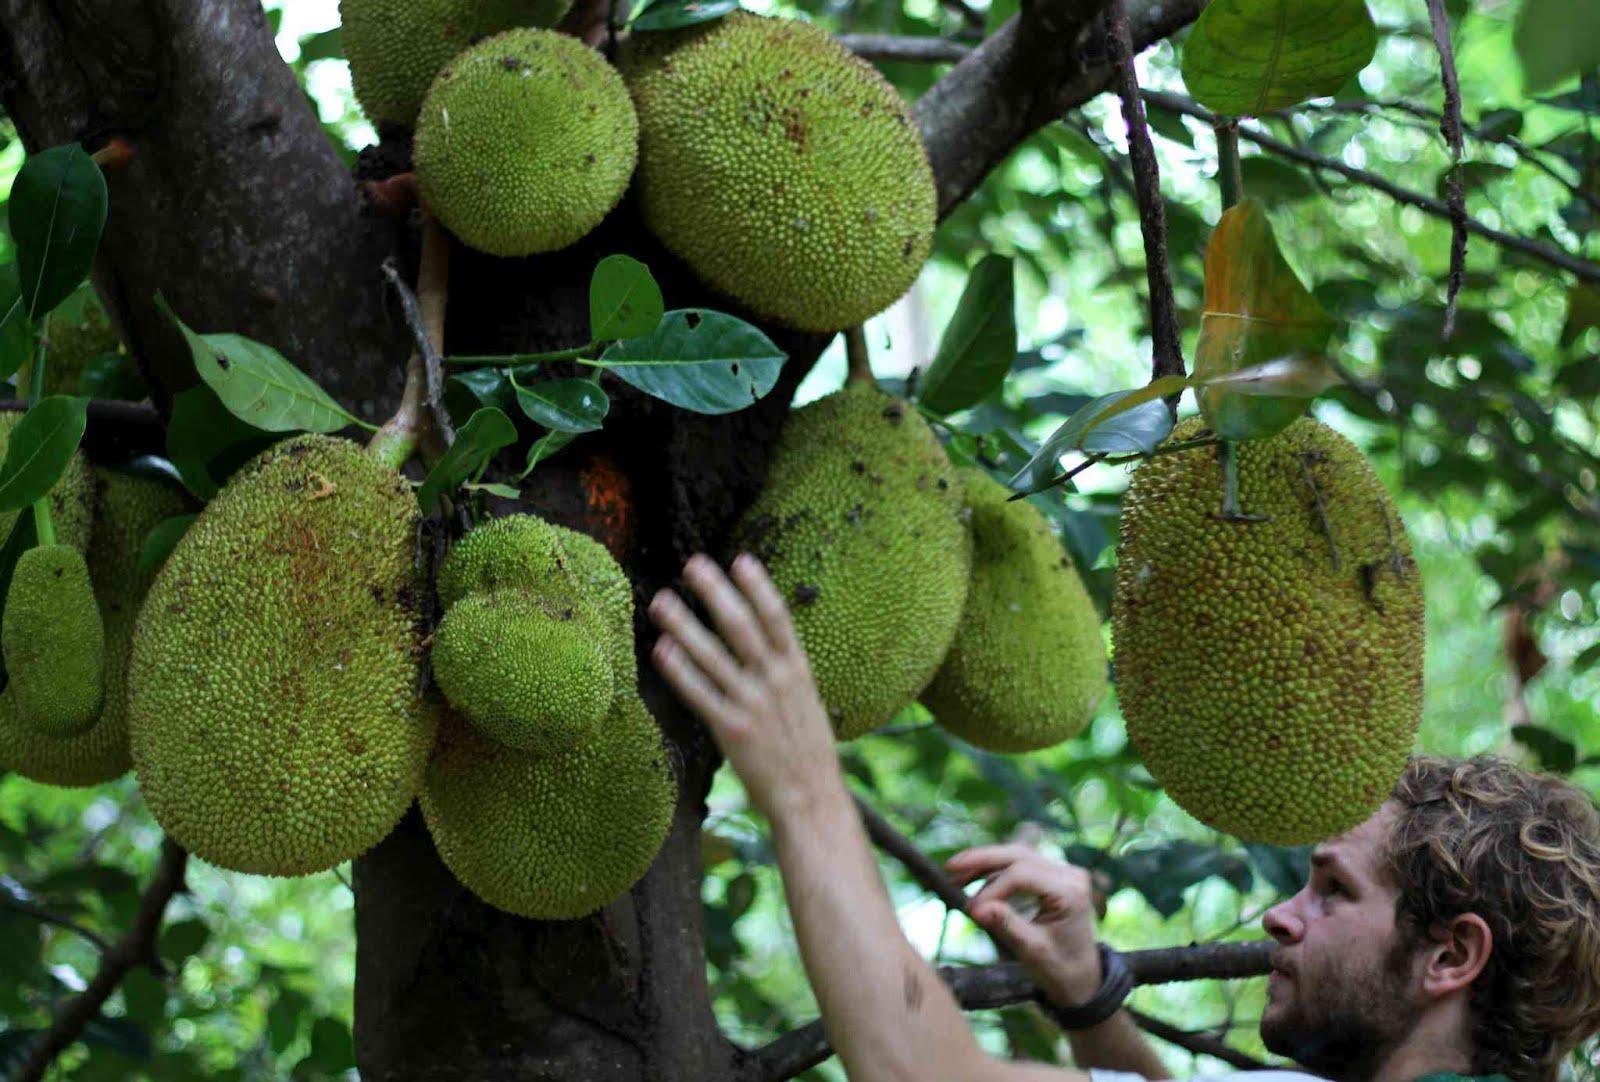 Project Bona Fide The Jackfruit Manifesto